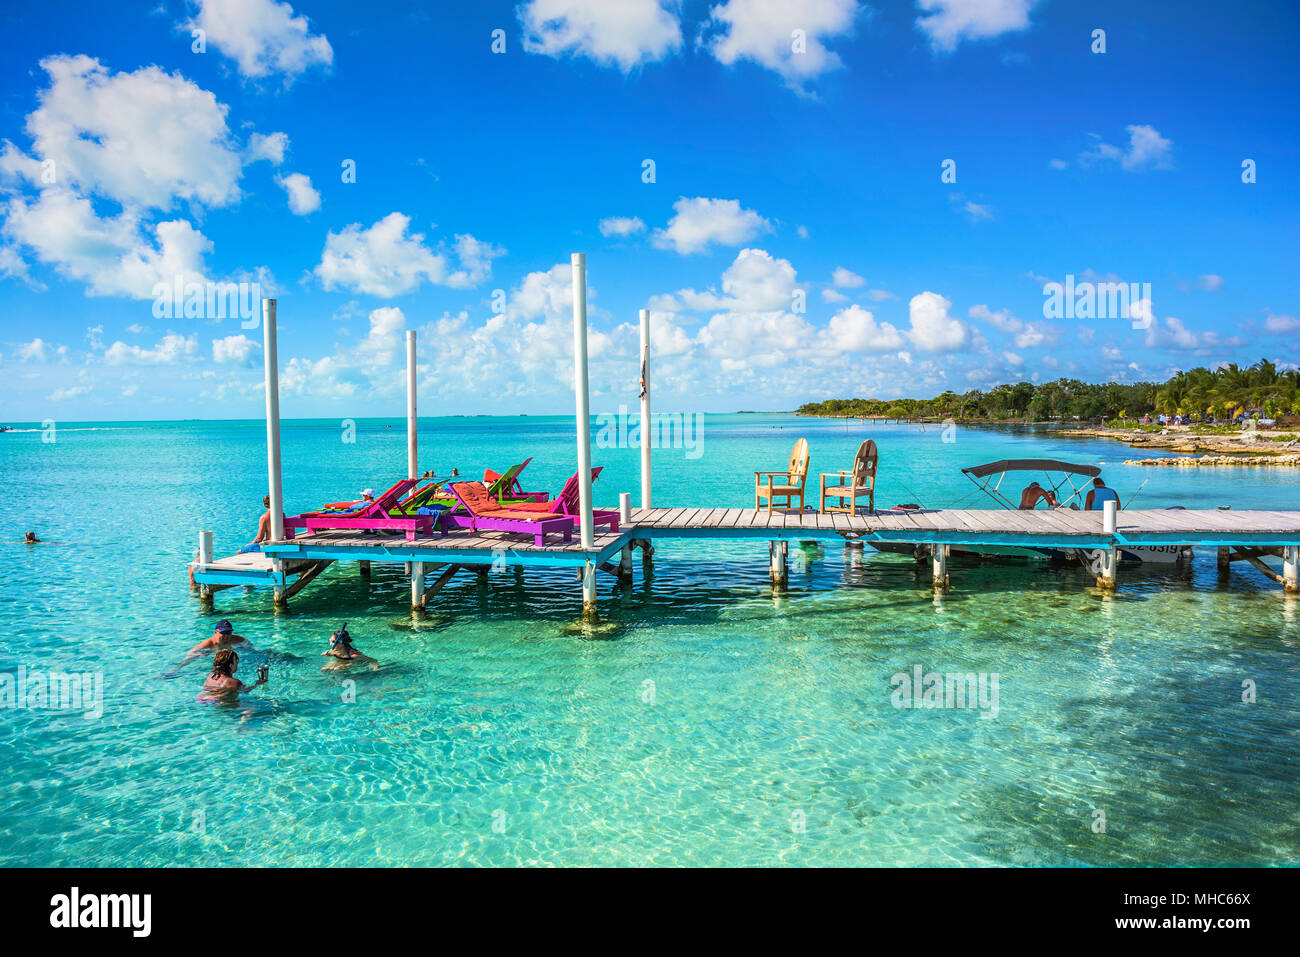 Secret Beach in Ambergris Caye, Belize. Stock Photo